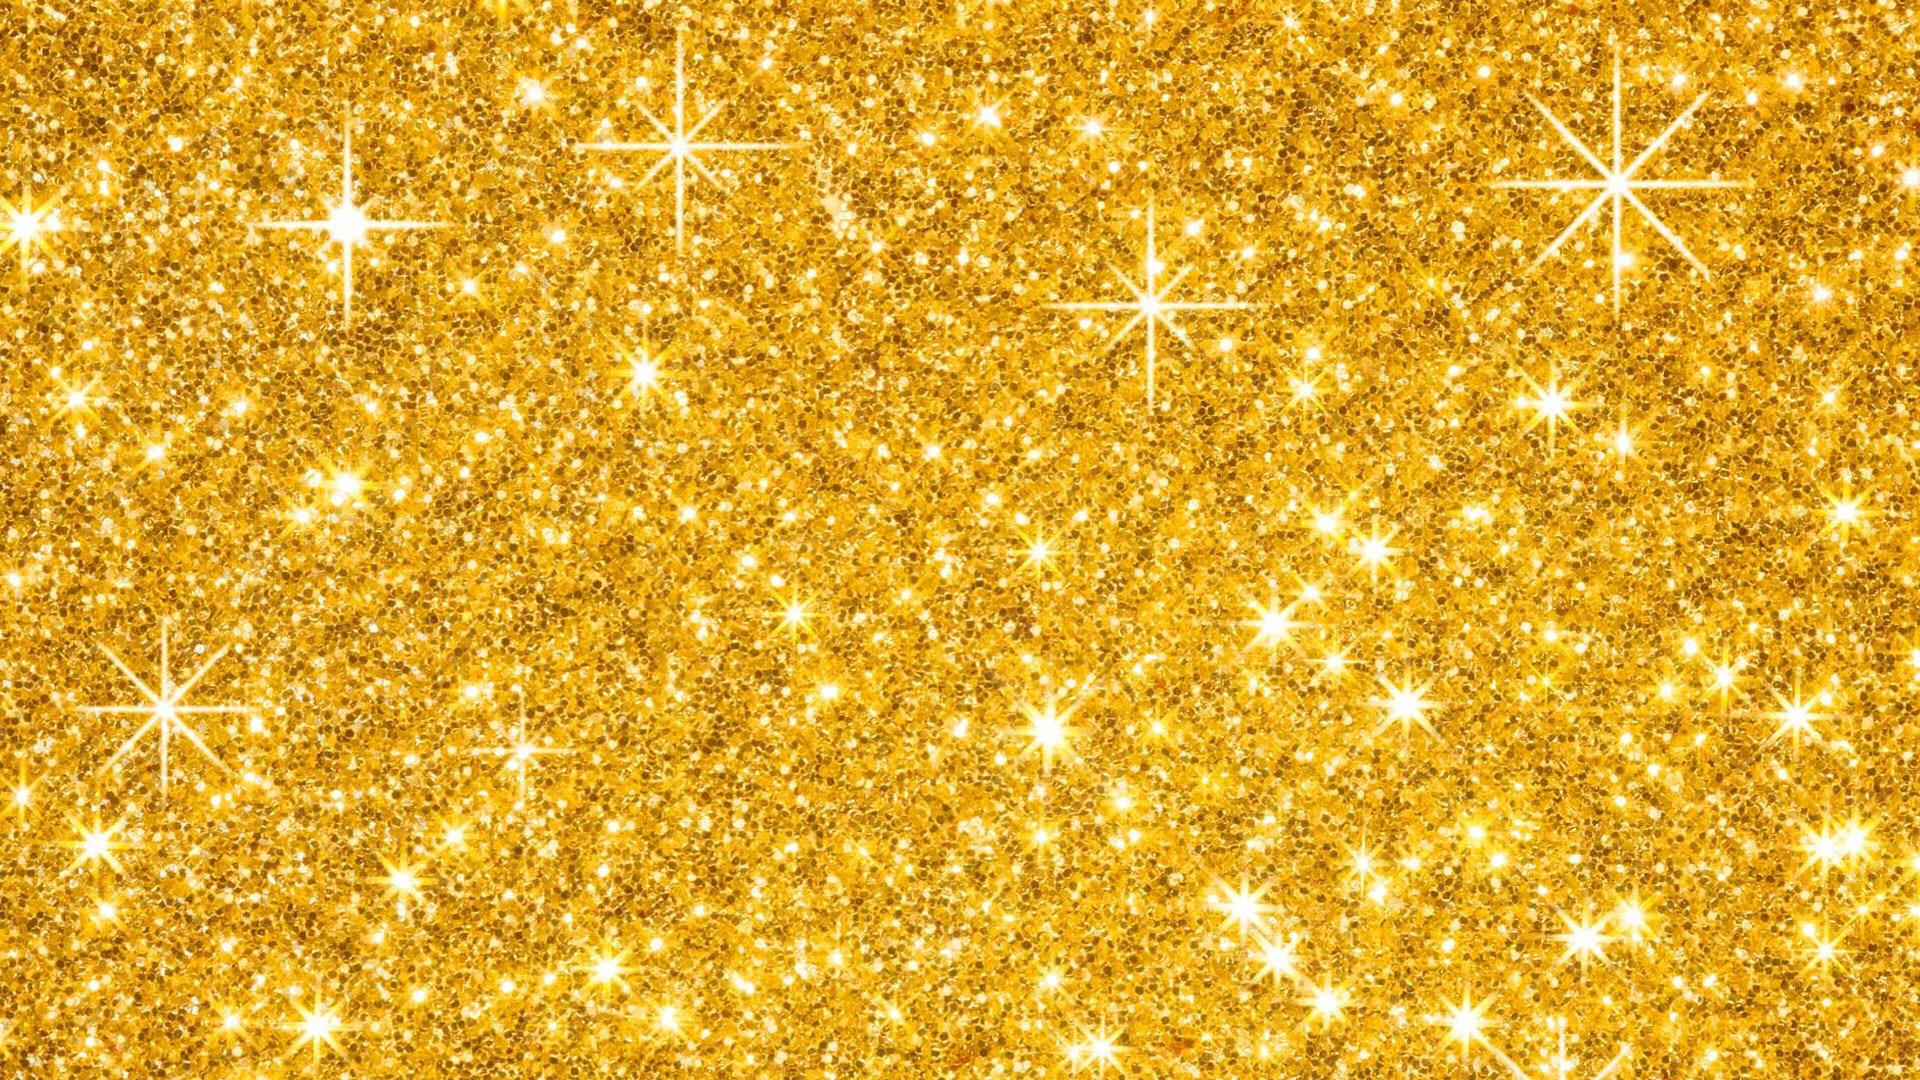 Gold Glitter Background Gold Glitter Background Glitter